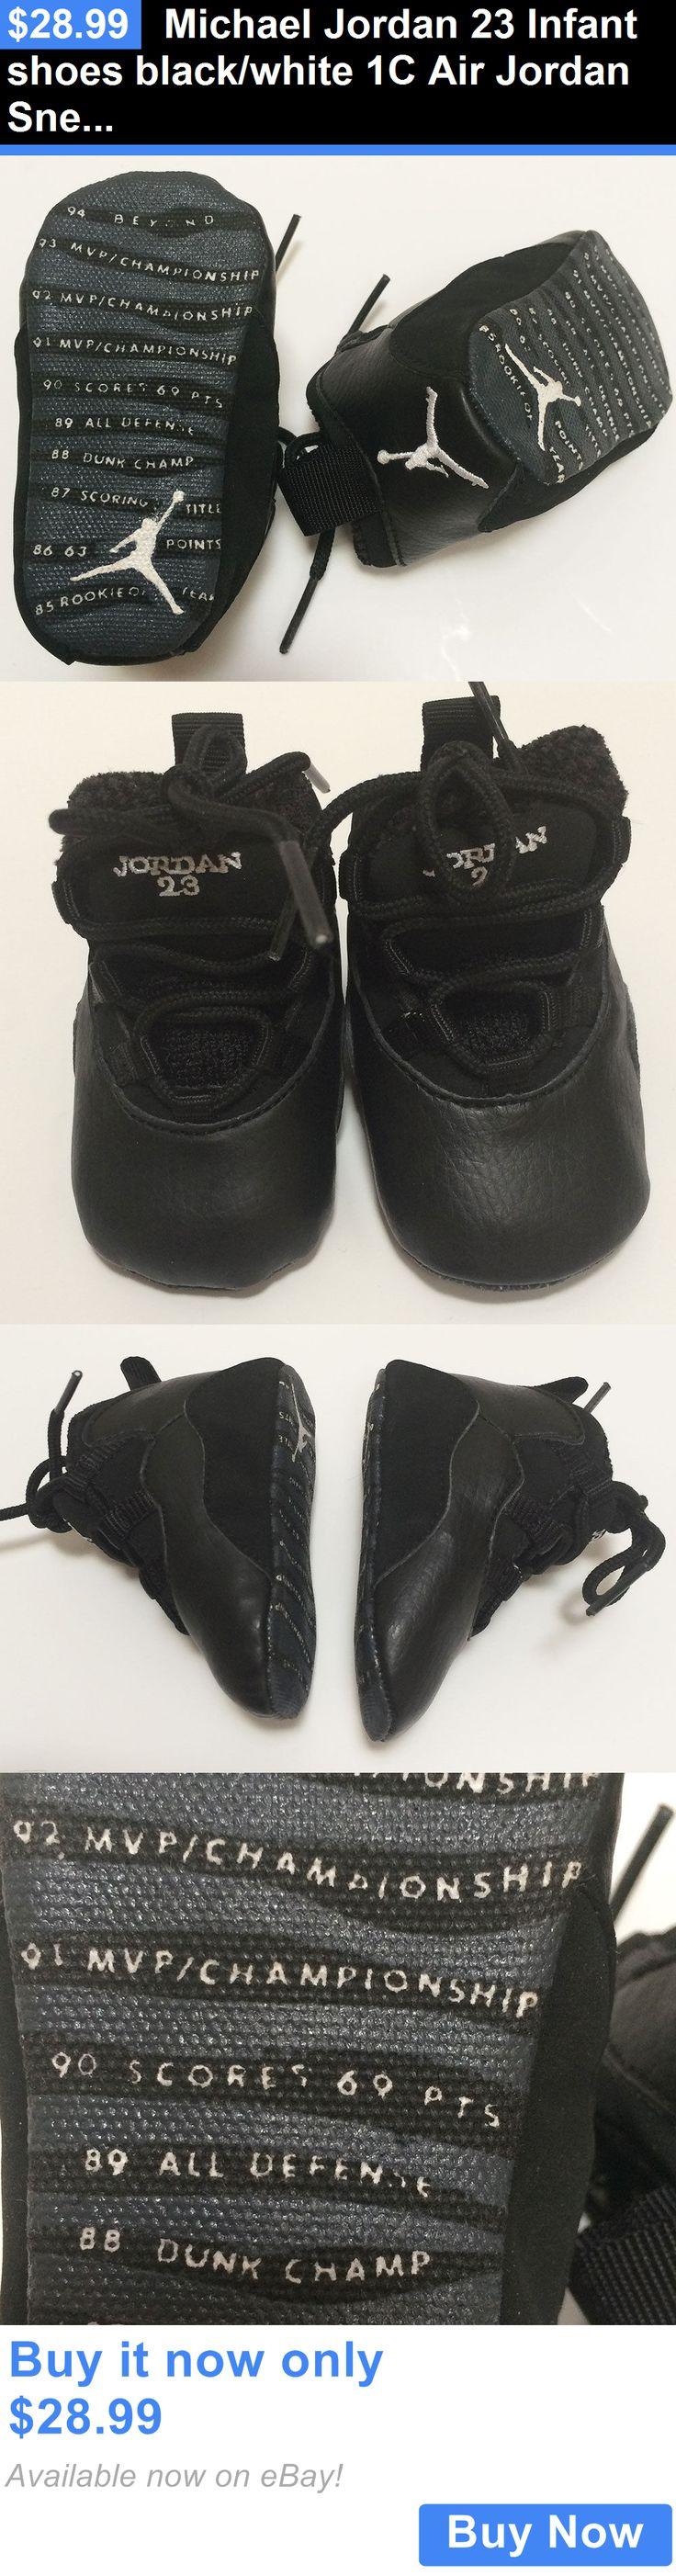 Michael Jordan Baby Clothing: Michael Jordan 23 Infant Shoes Black/White 1C Air Jordan Sneakers BUY IT NOW ONLY: $28.99